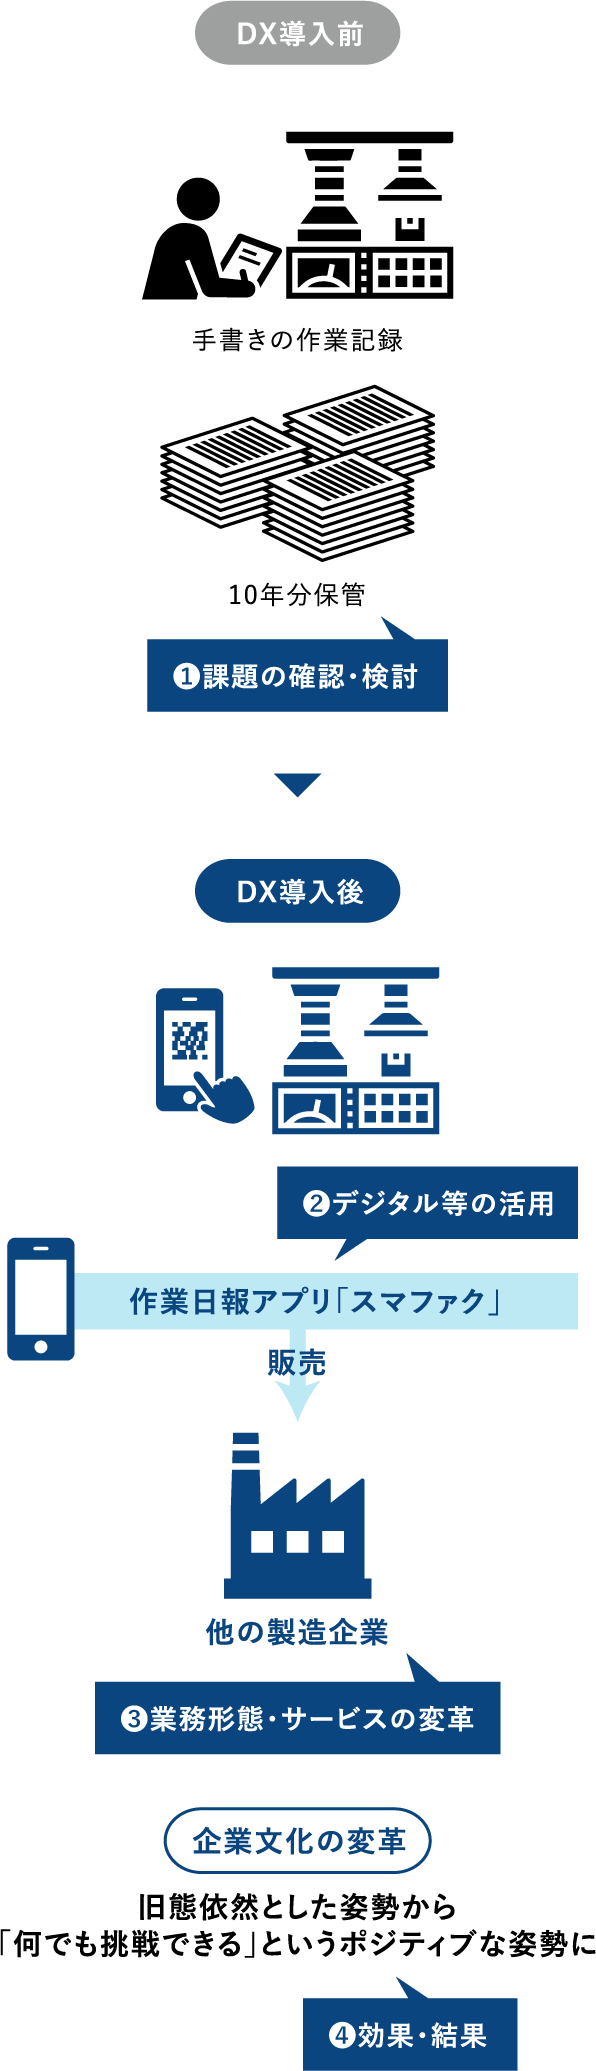 DX導入前 DX導入後